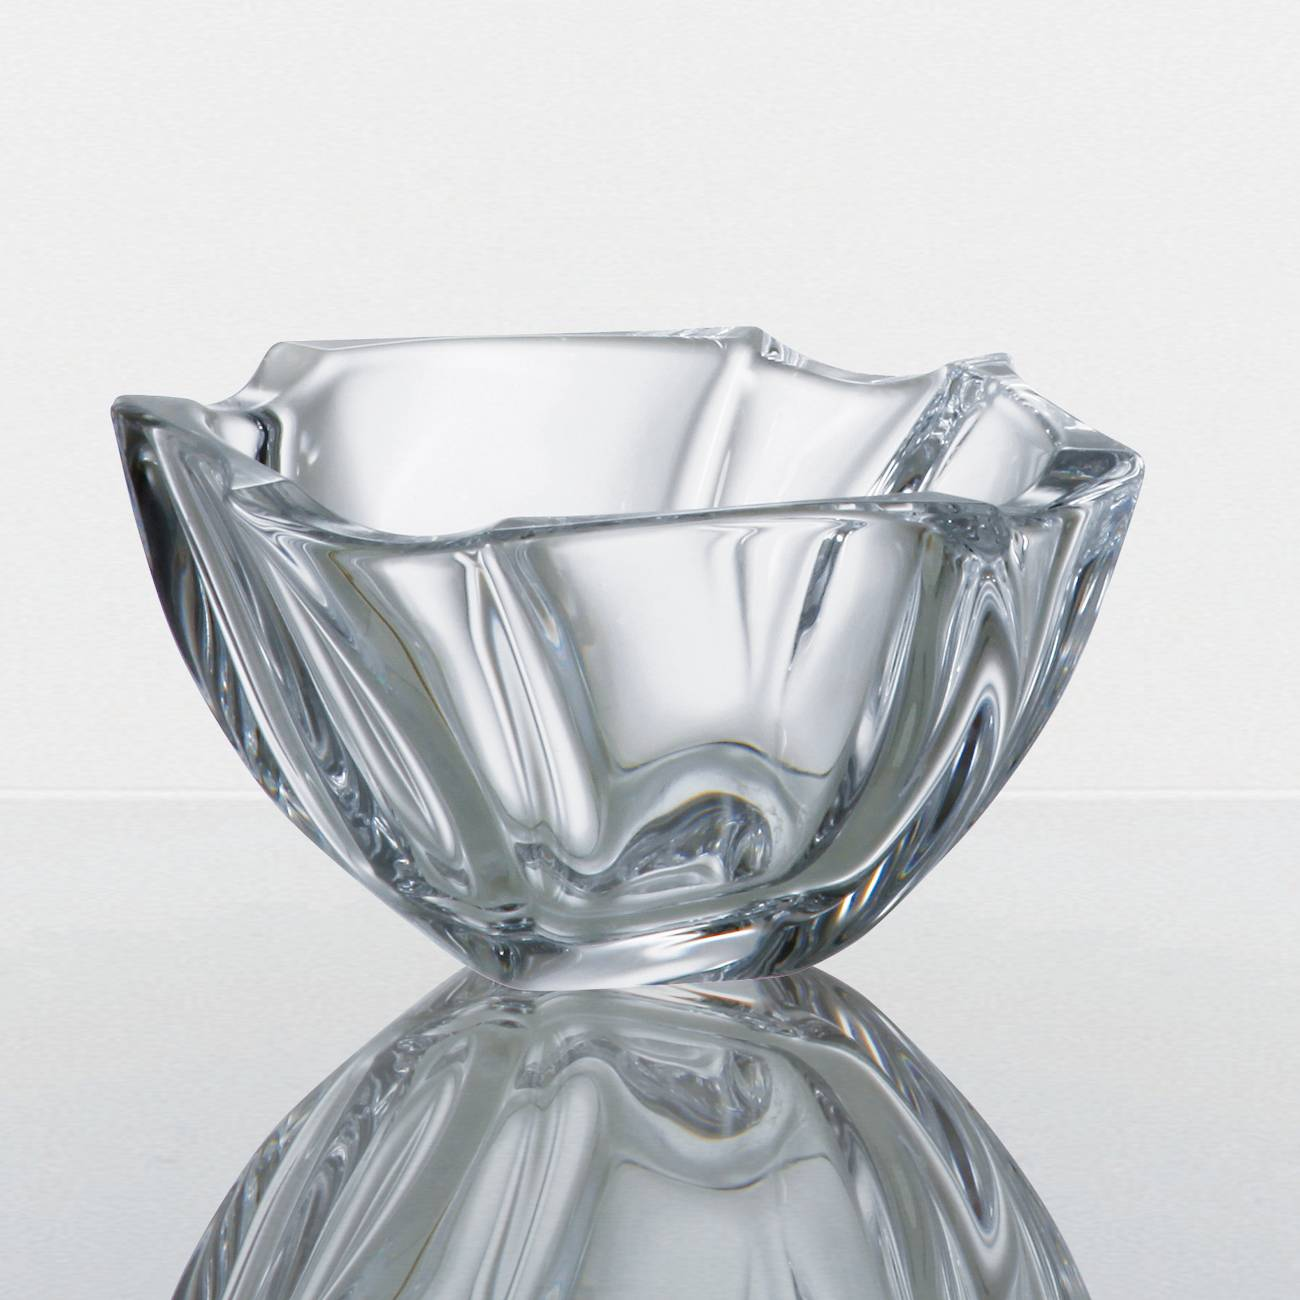 Conjunto 6 Tigelas Bowls Neptun em Cristal - Bohemia Crystalite - 13 cm